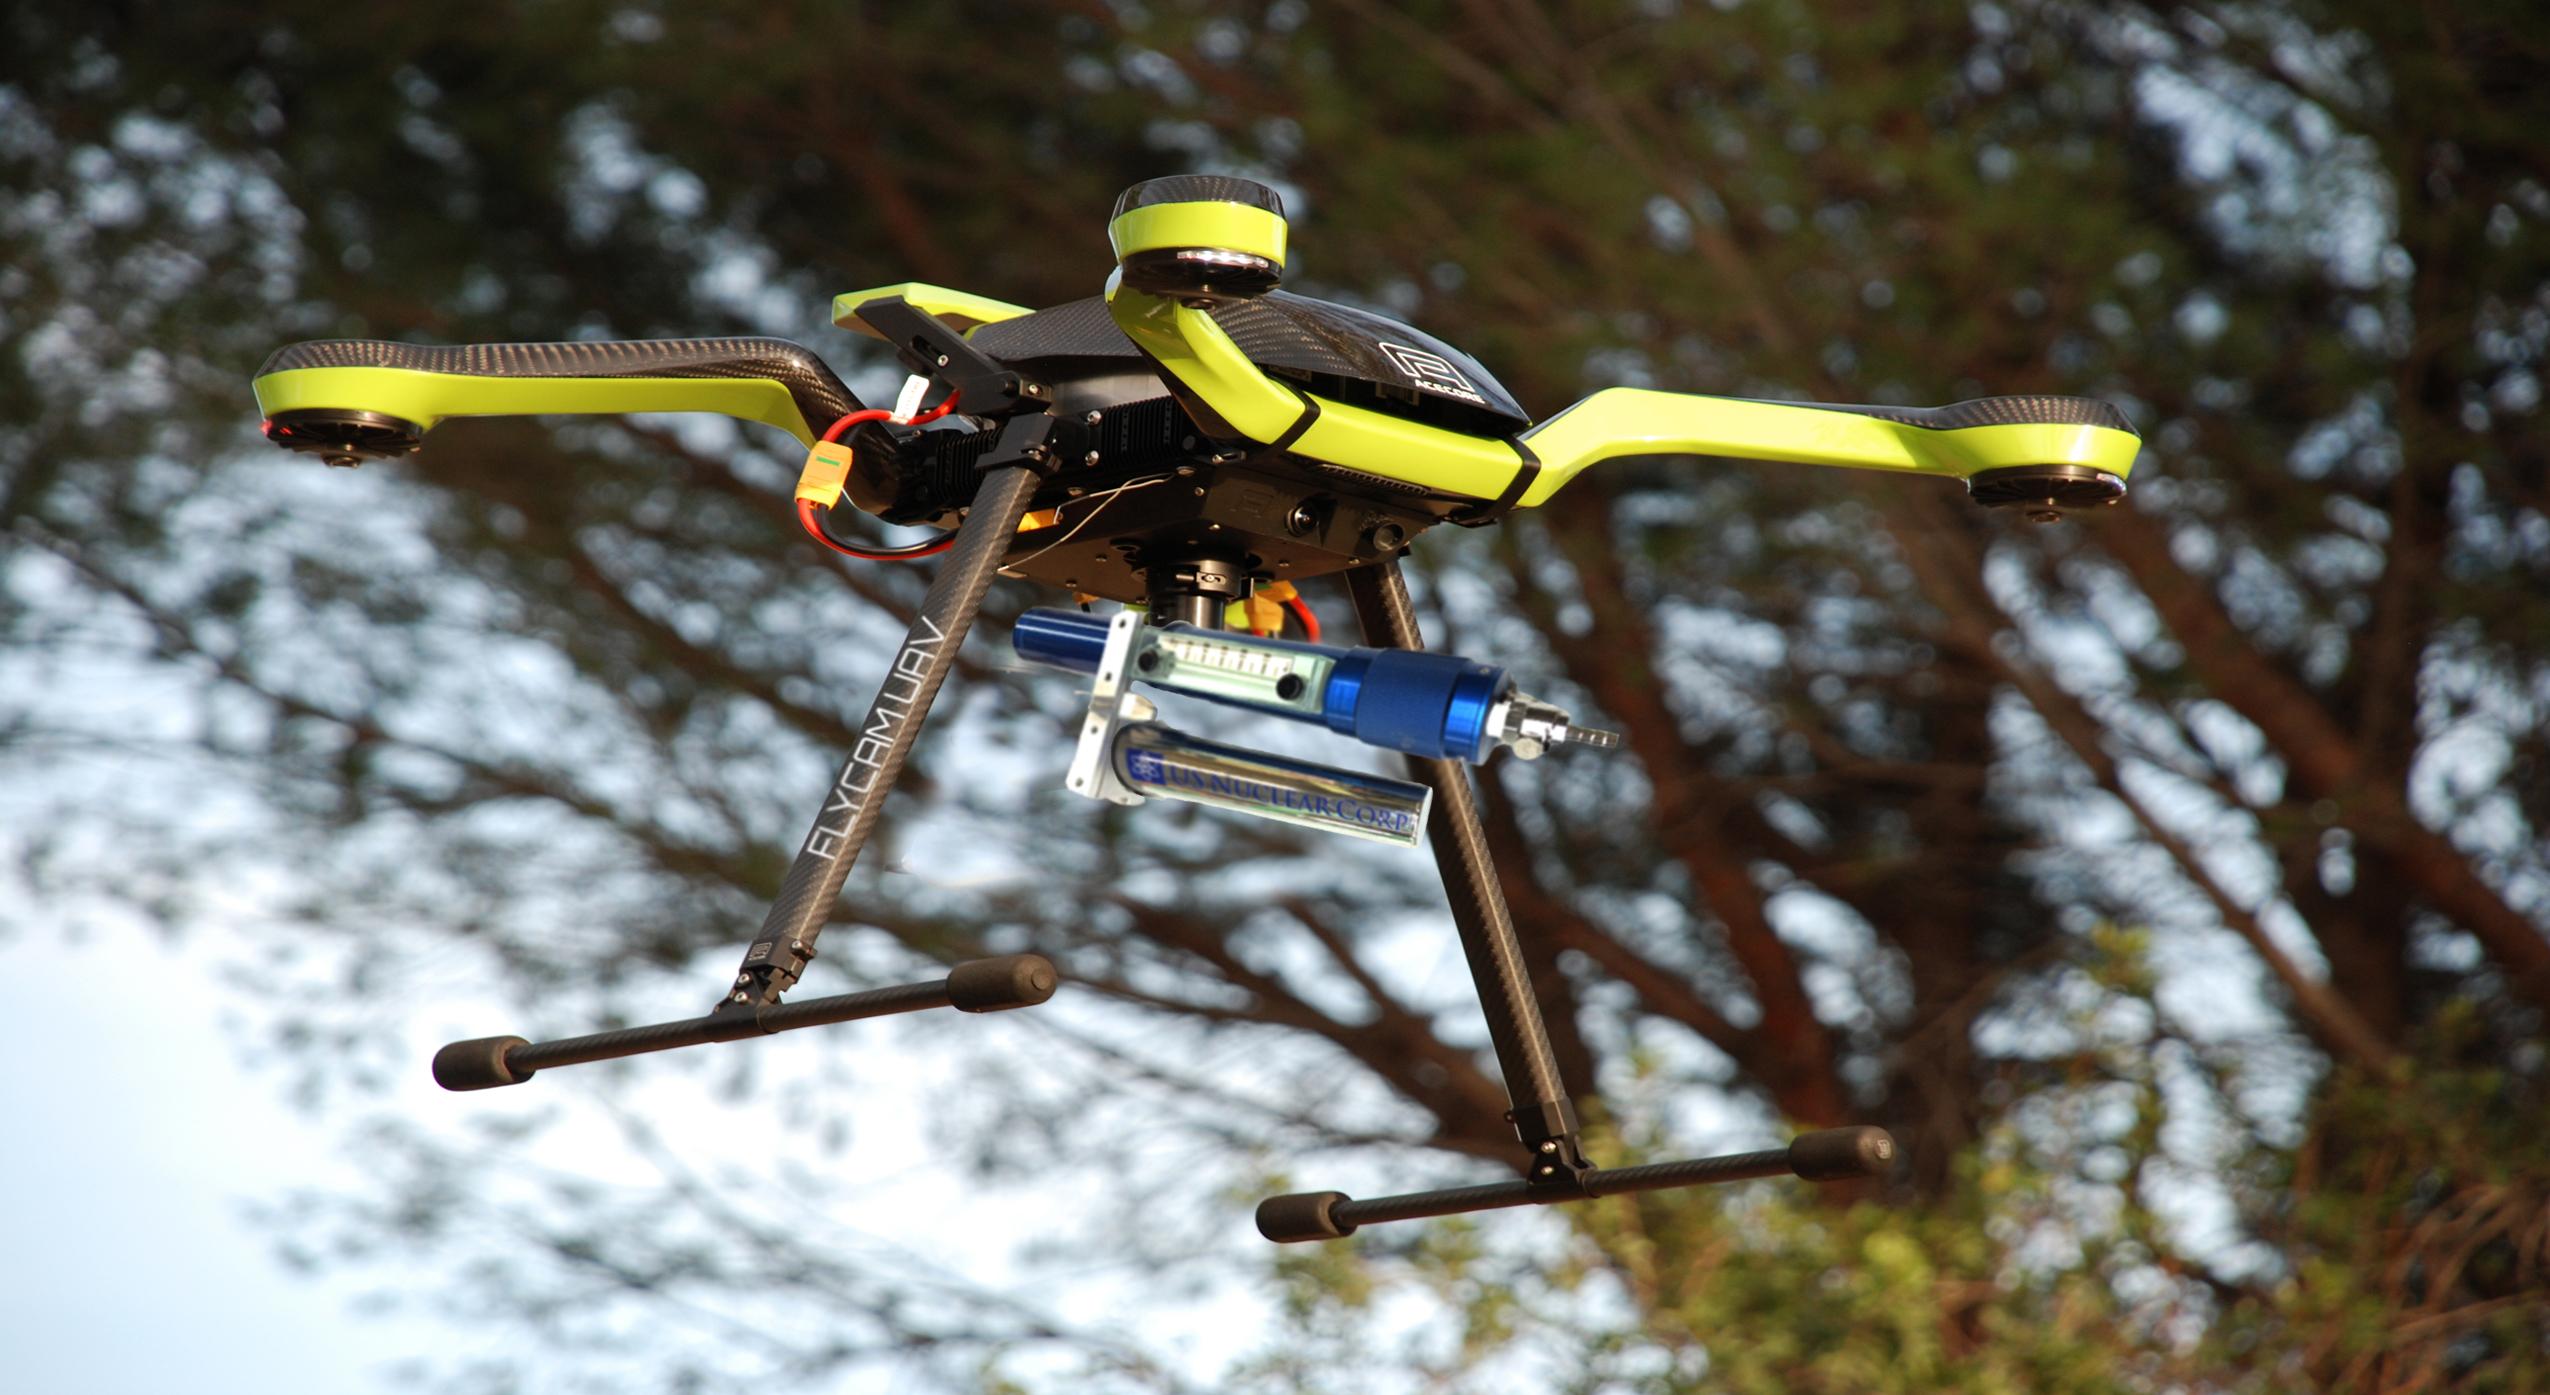 Aerial Radiation Detection, UAV Radiation Monitoring, UAV Radiation Detection System, Drone Radiation Detector, UAV Radiation Detector